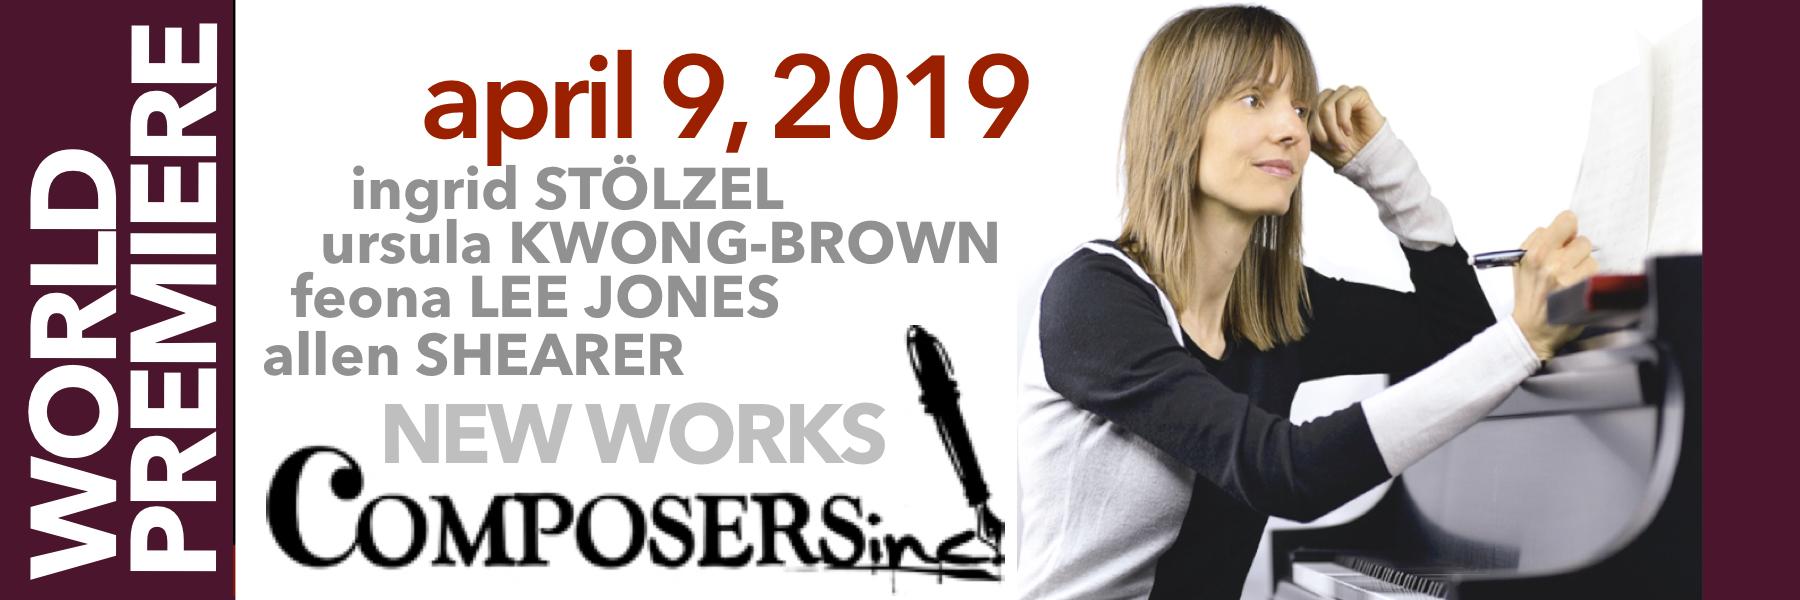 2019 Composers Inc.jpg